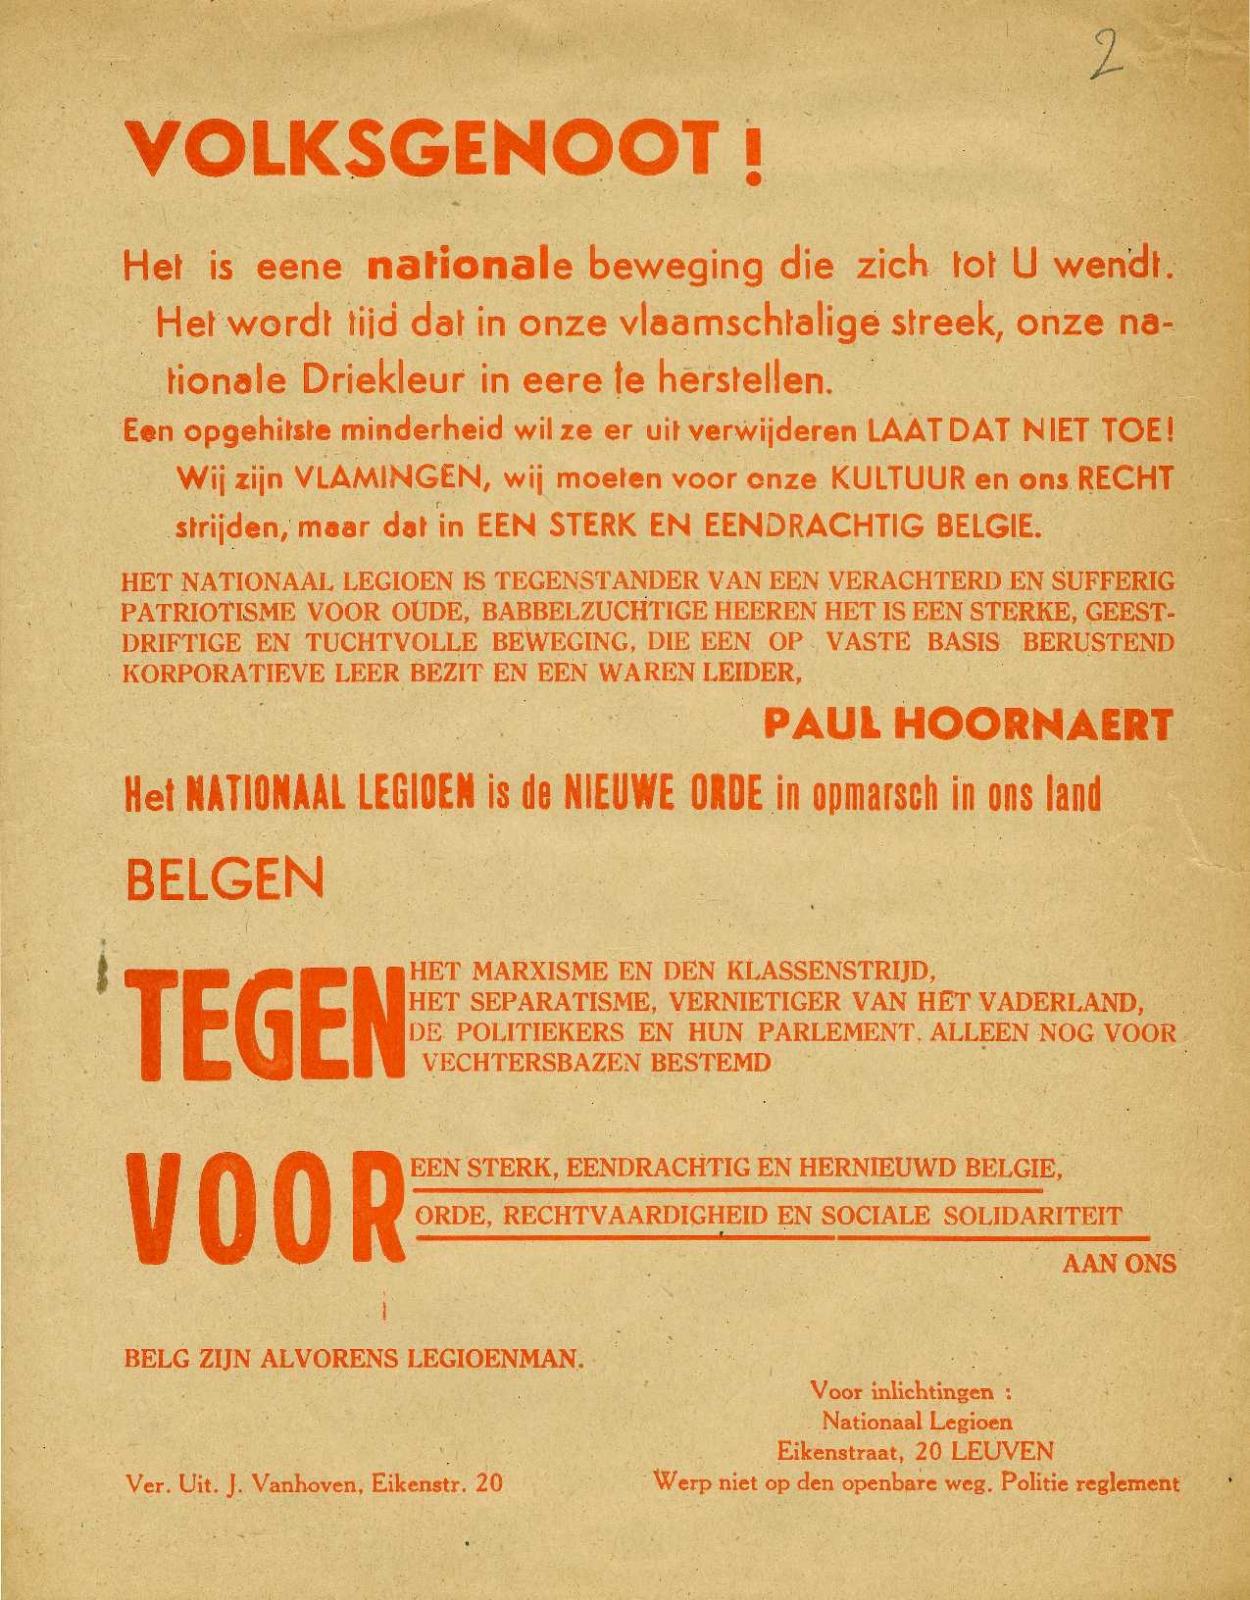 283545-lAgion-nationale-contre-le-marxisme-sd.jpg